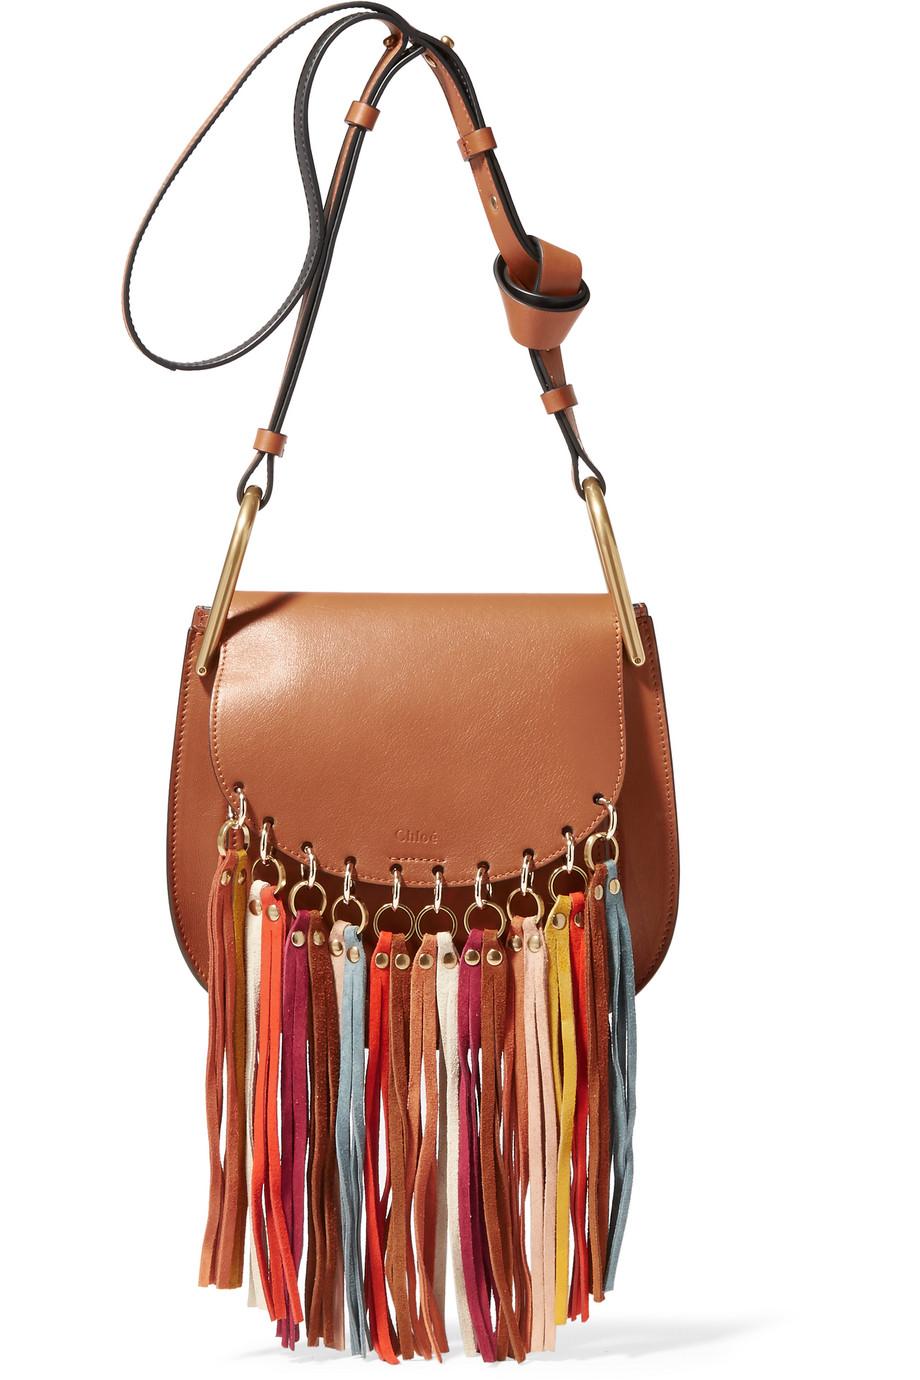 Chloé Hudson Tasseled Leather Shoulder Bag, Light Brown, Women's